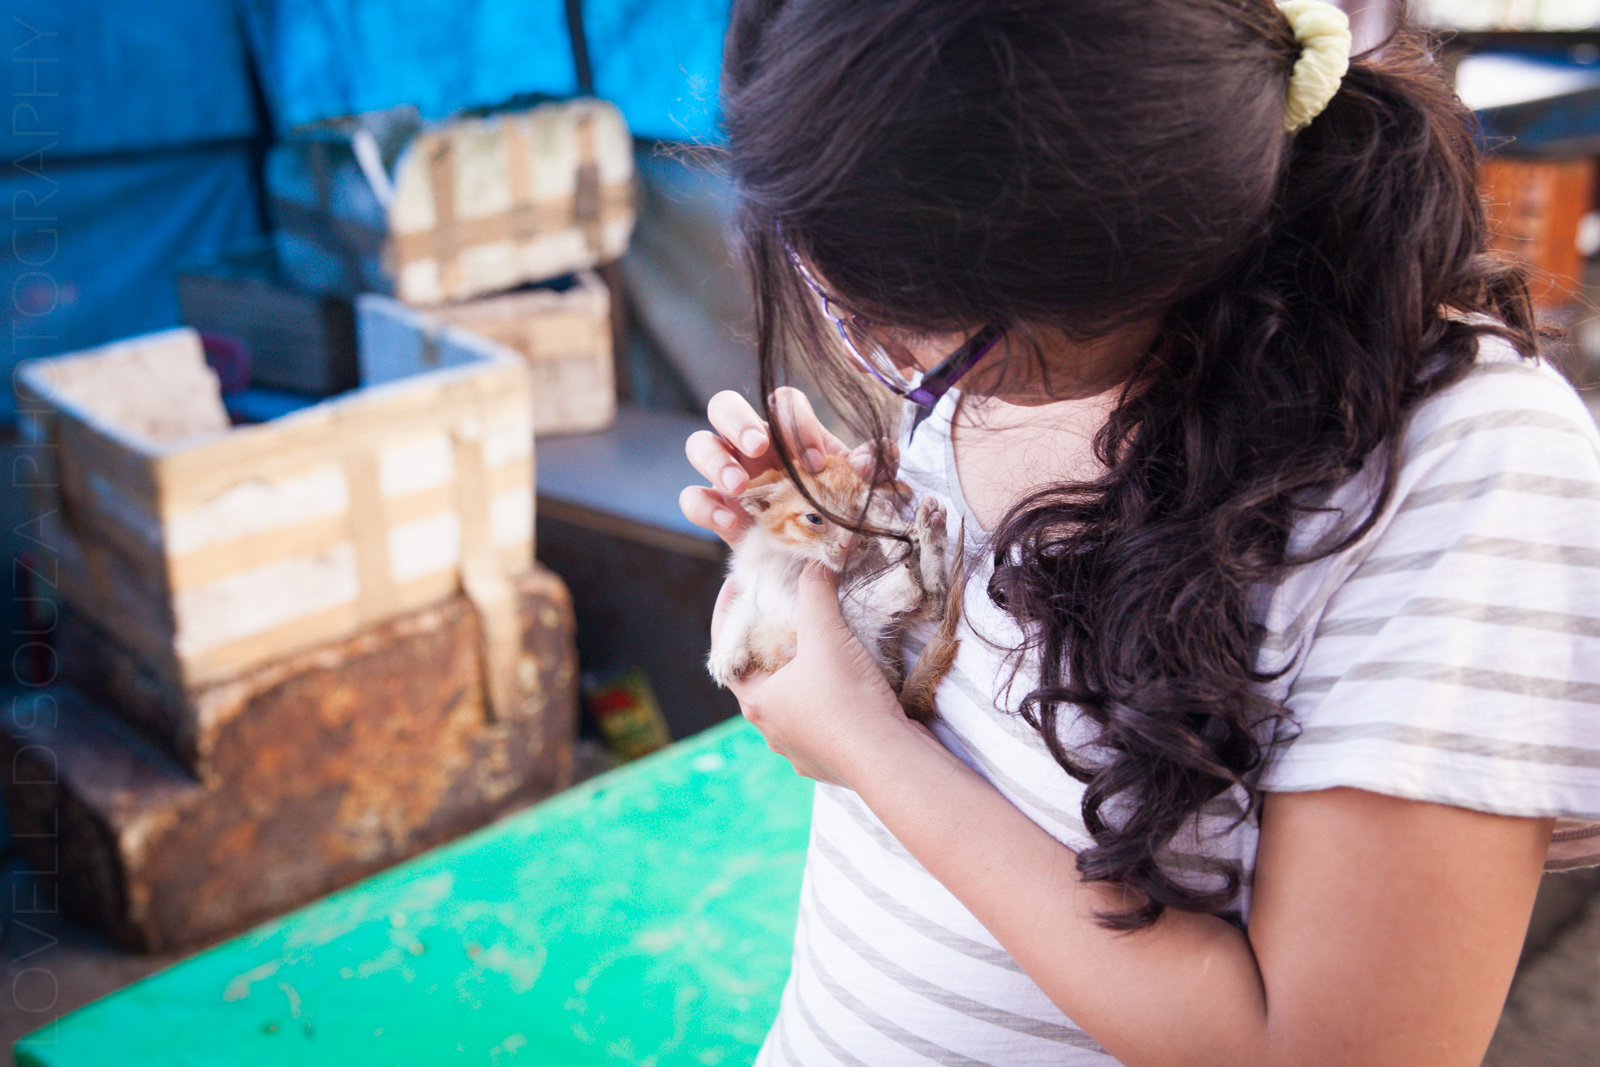 Priya and the kitten